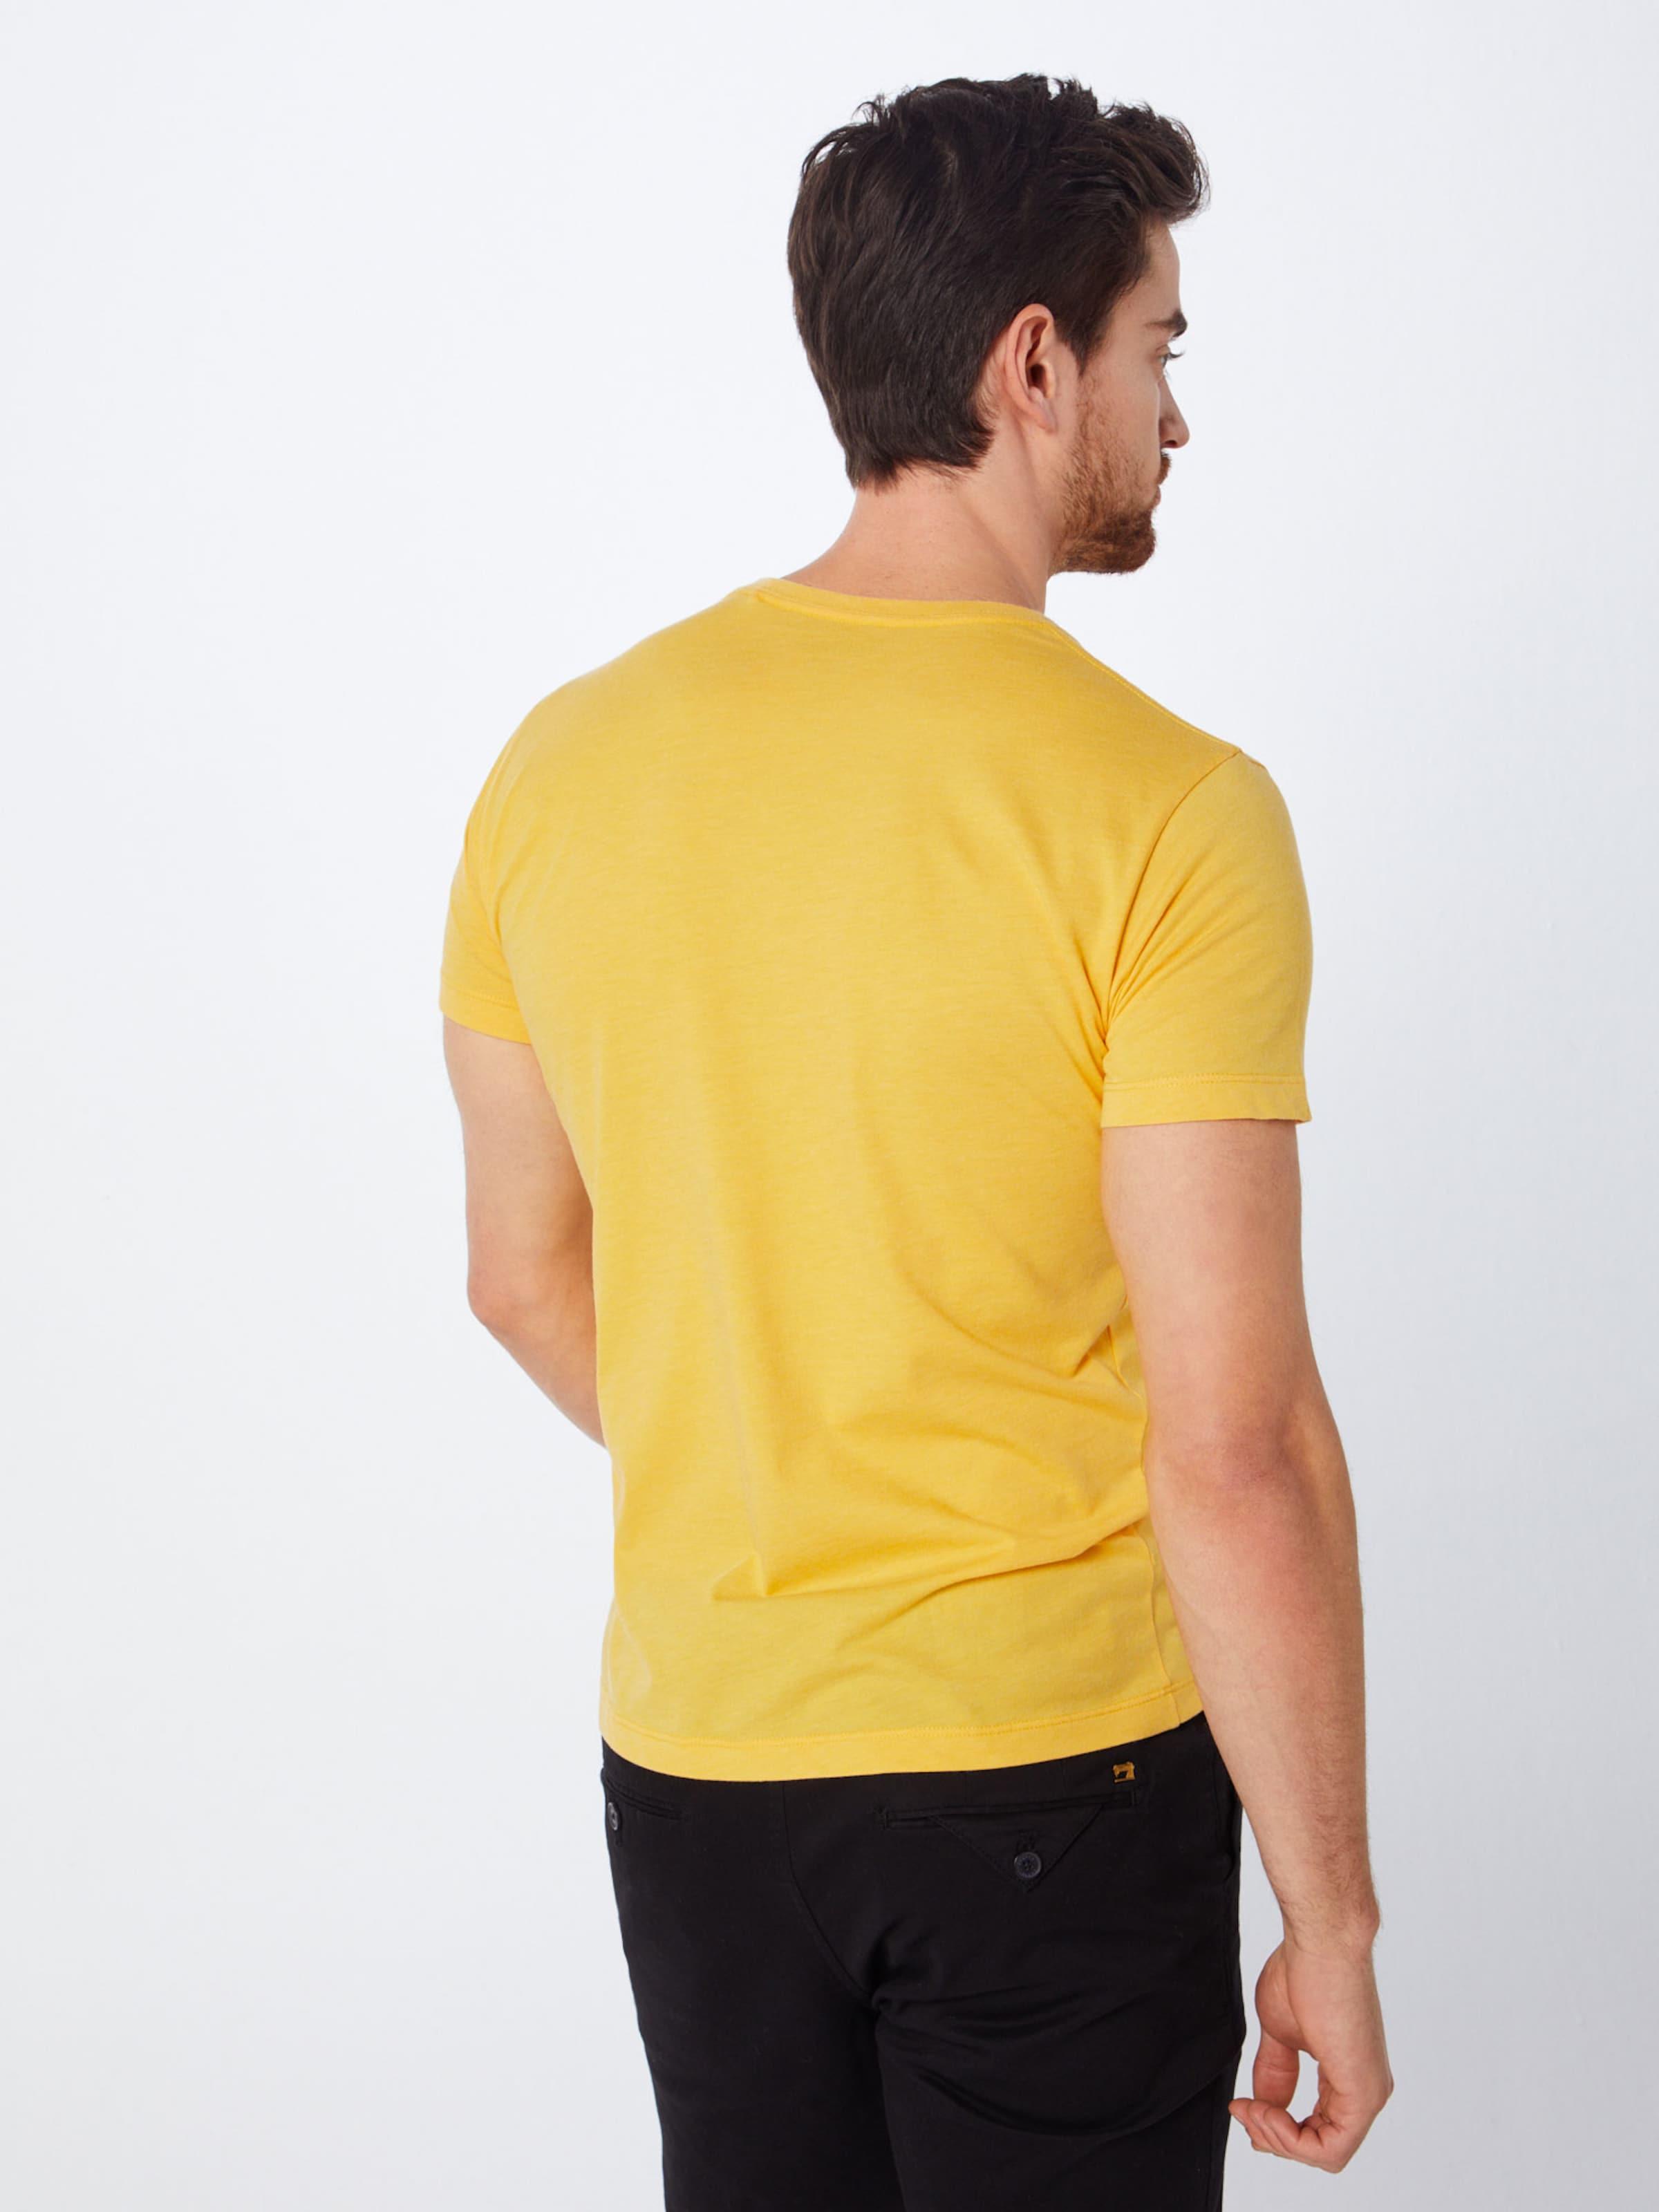 En Jeans JauneNoir shirt 'dacey' T Blanc Pepe WDH9E2YbeI